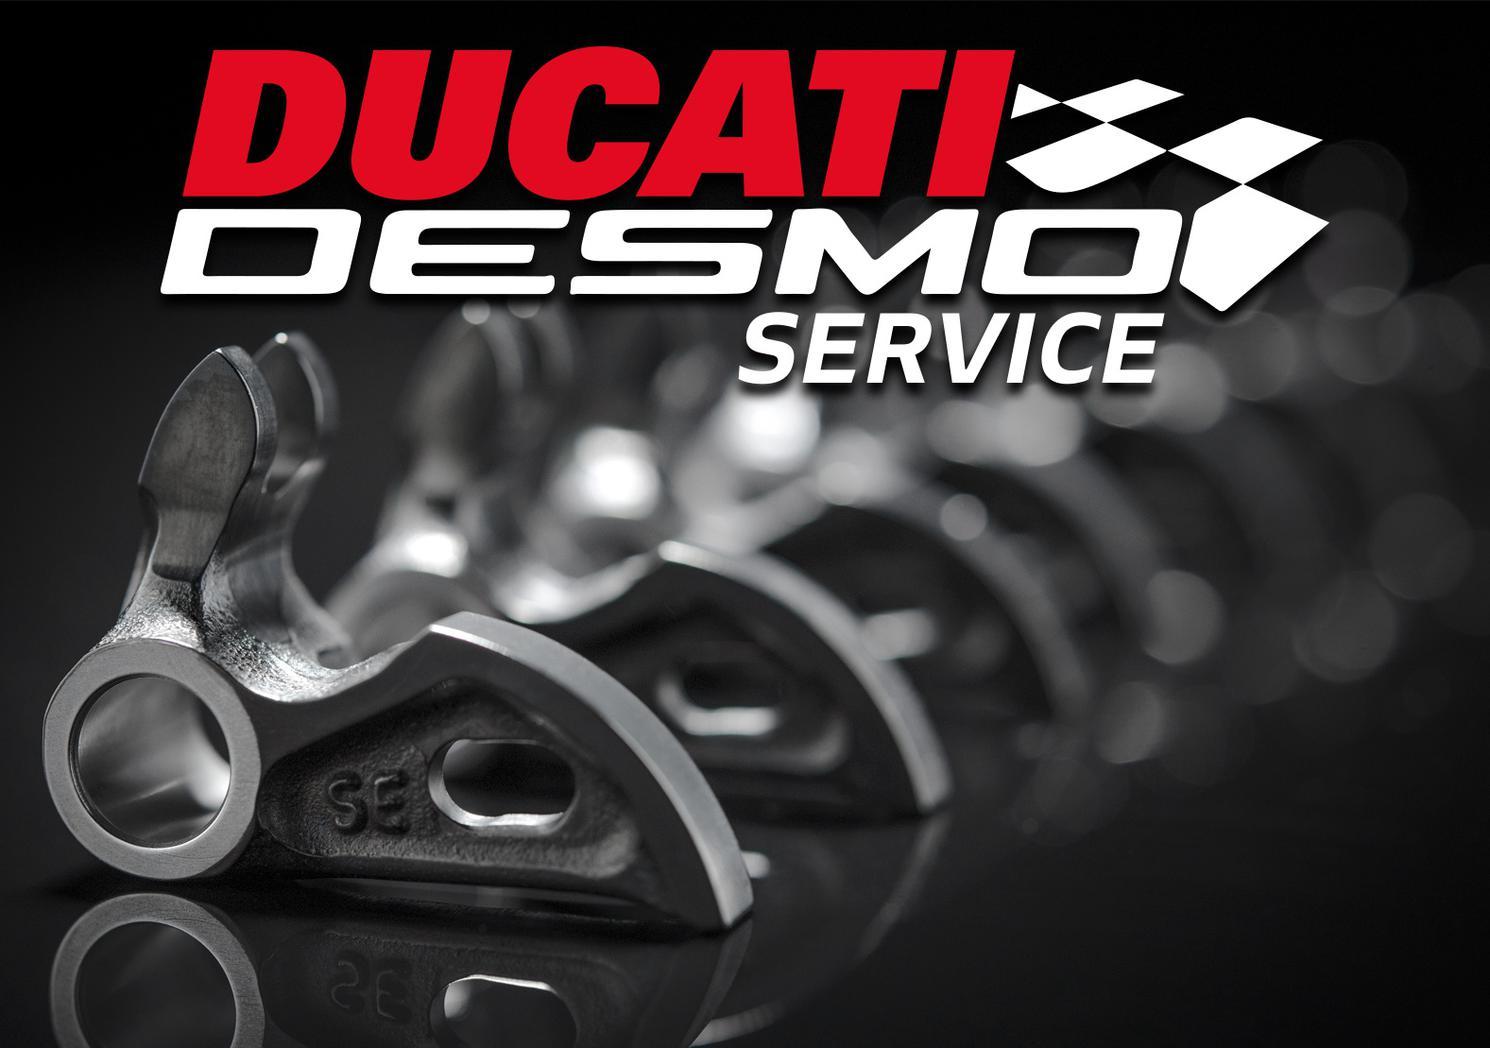 2014 Ducati Multistrada 1200 Pikes Peak - Frais inclus+Taxes